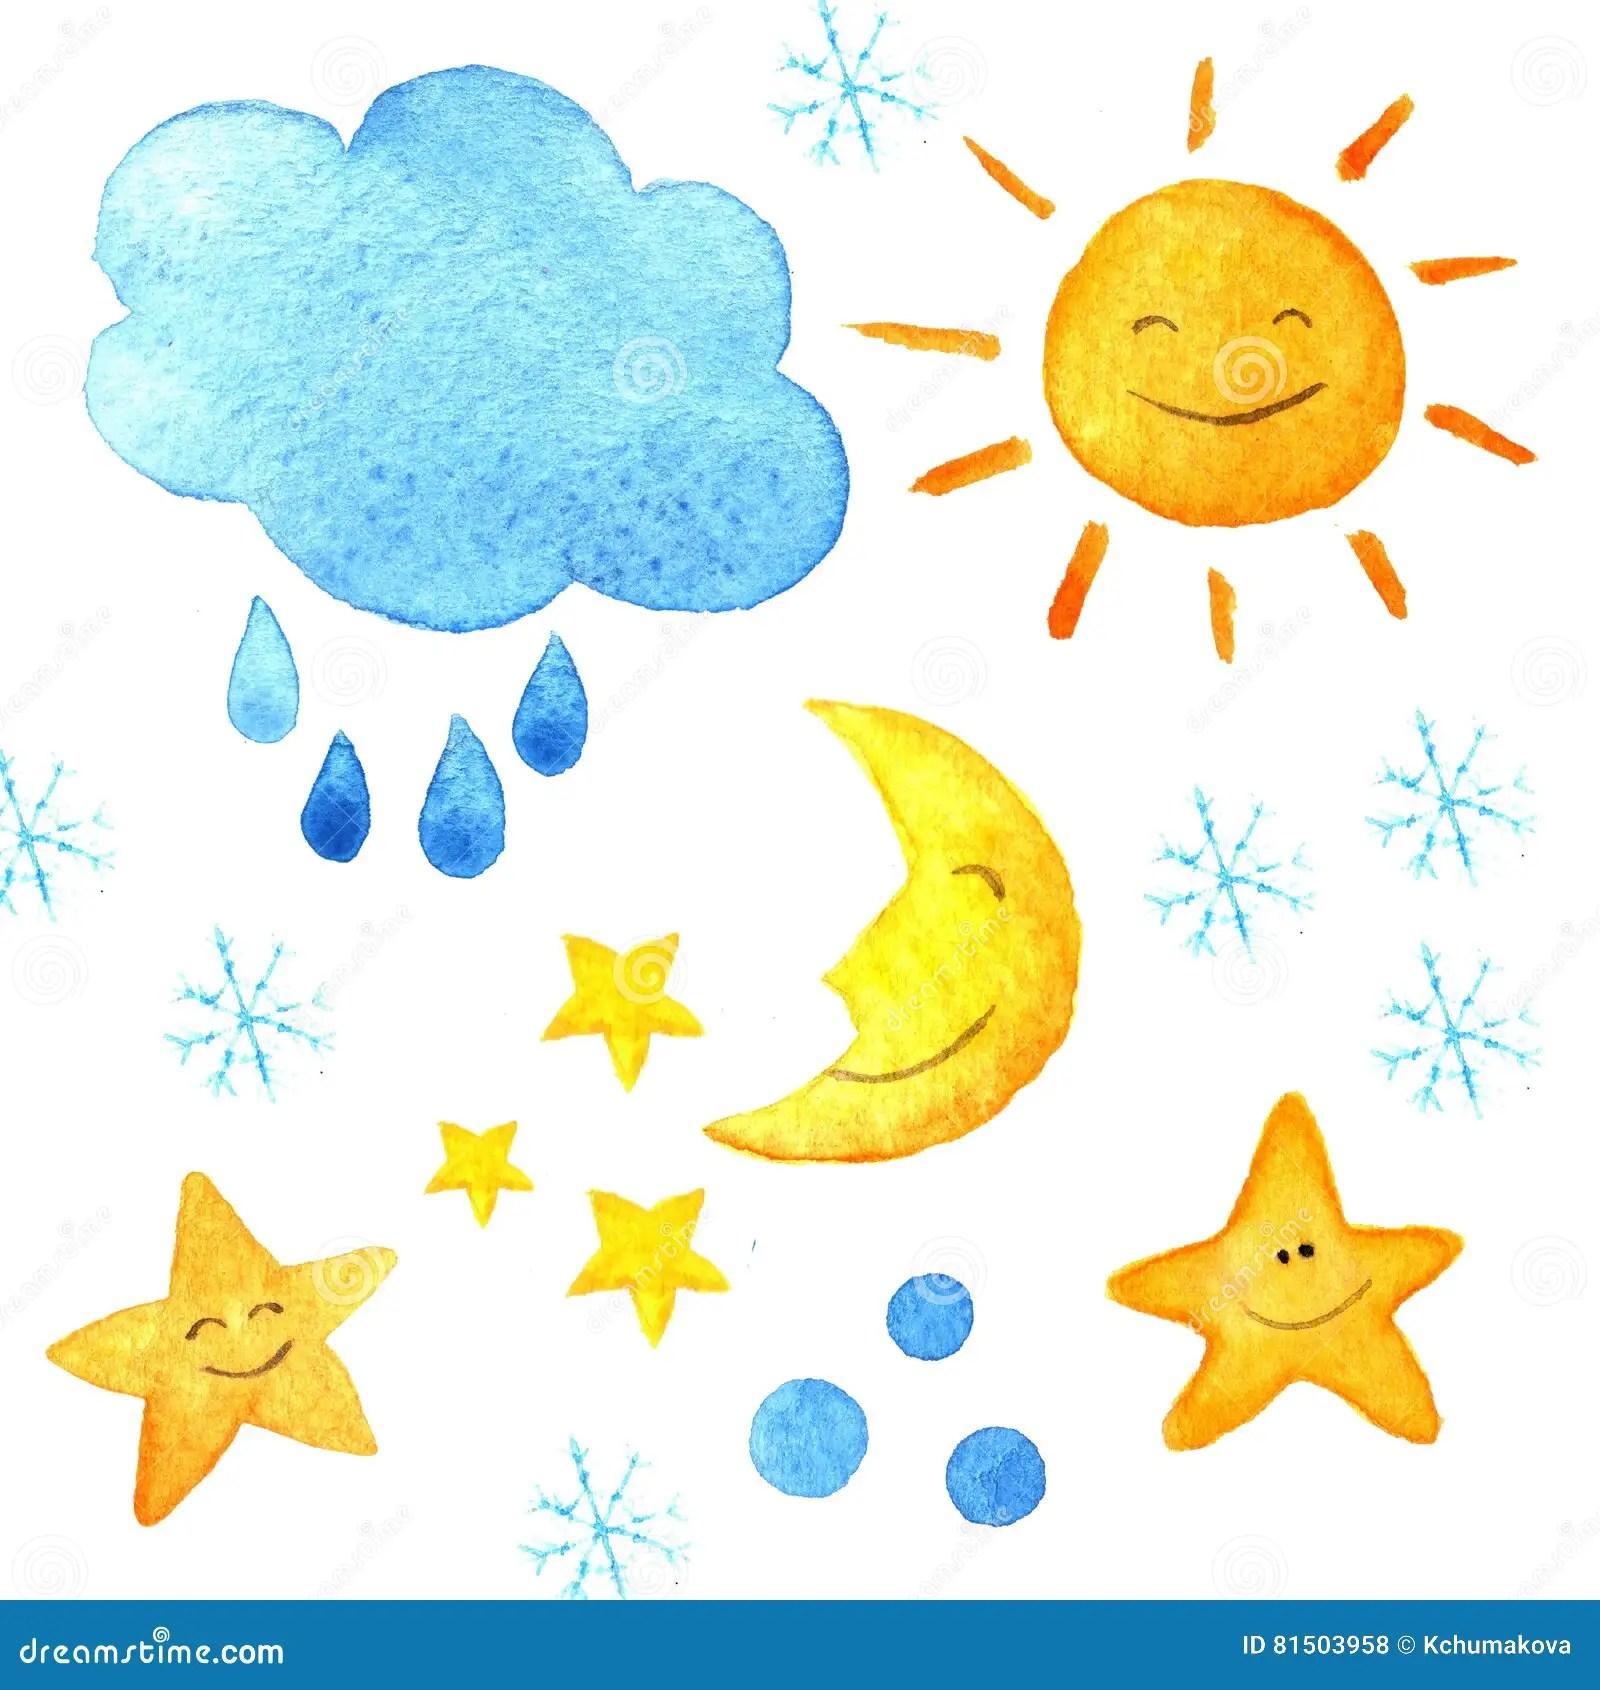 Weather Watercolor Pattern Cute Smiling Sun Moon Star